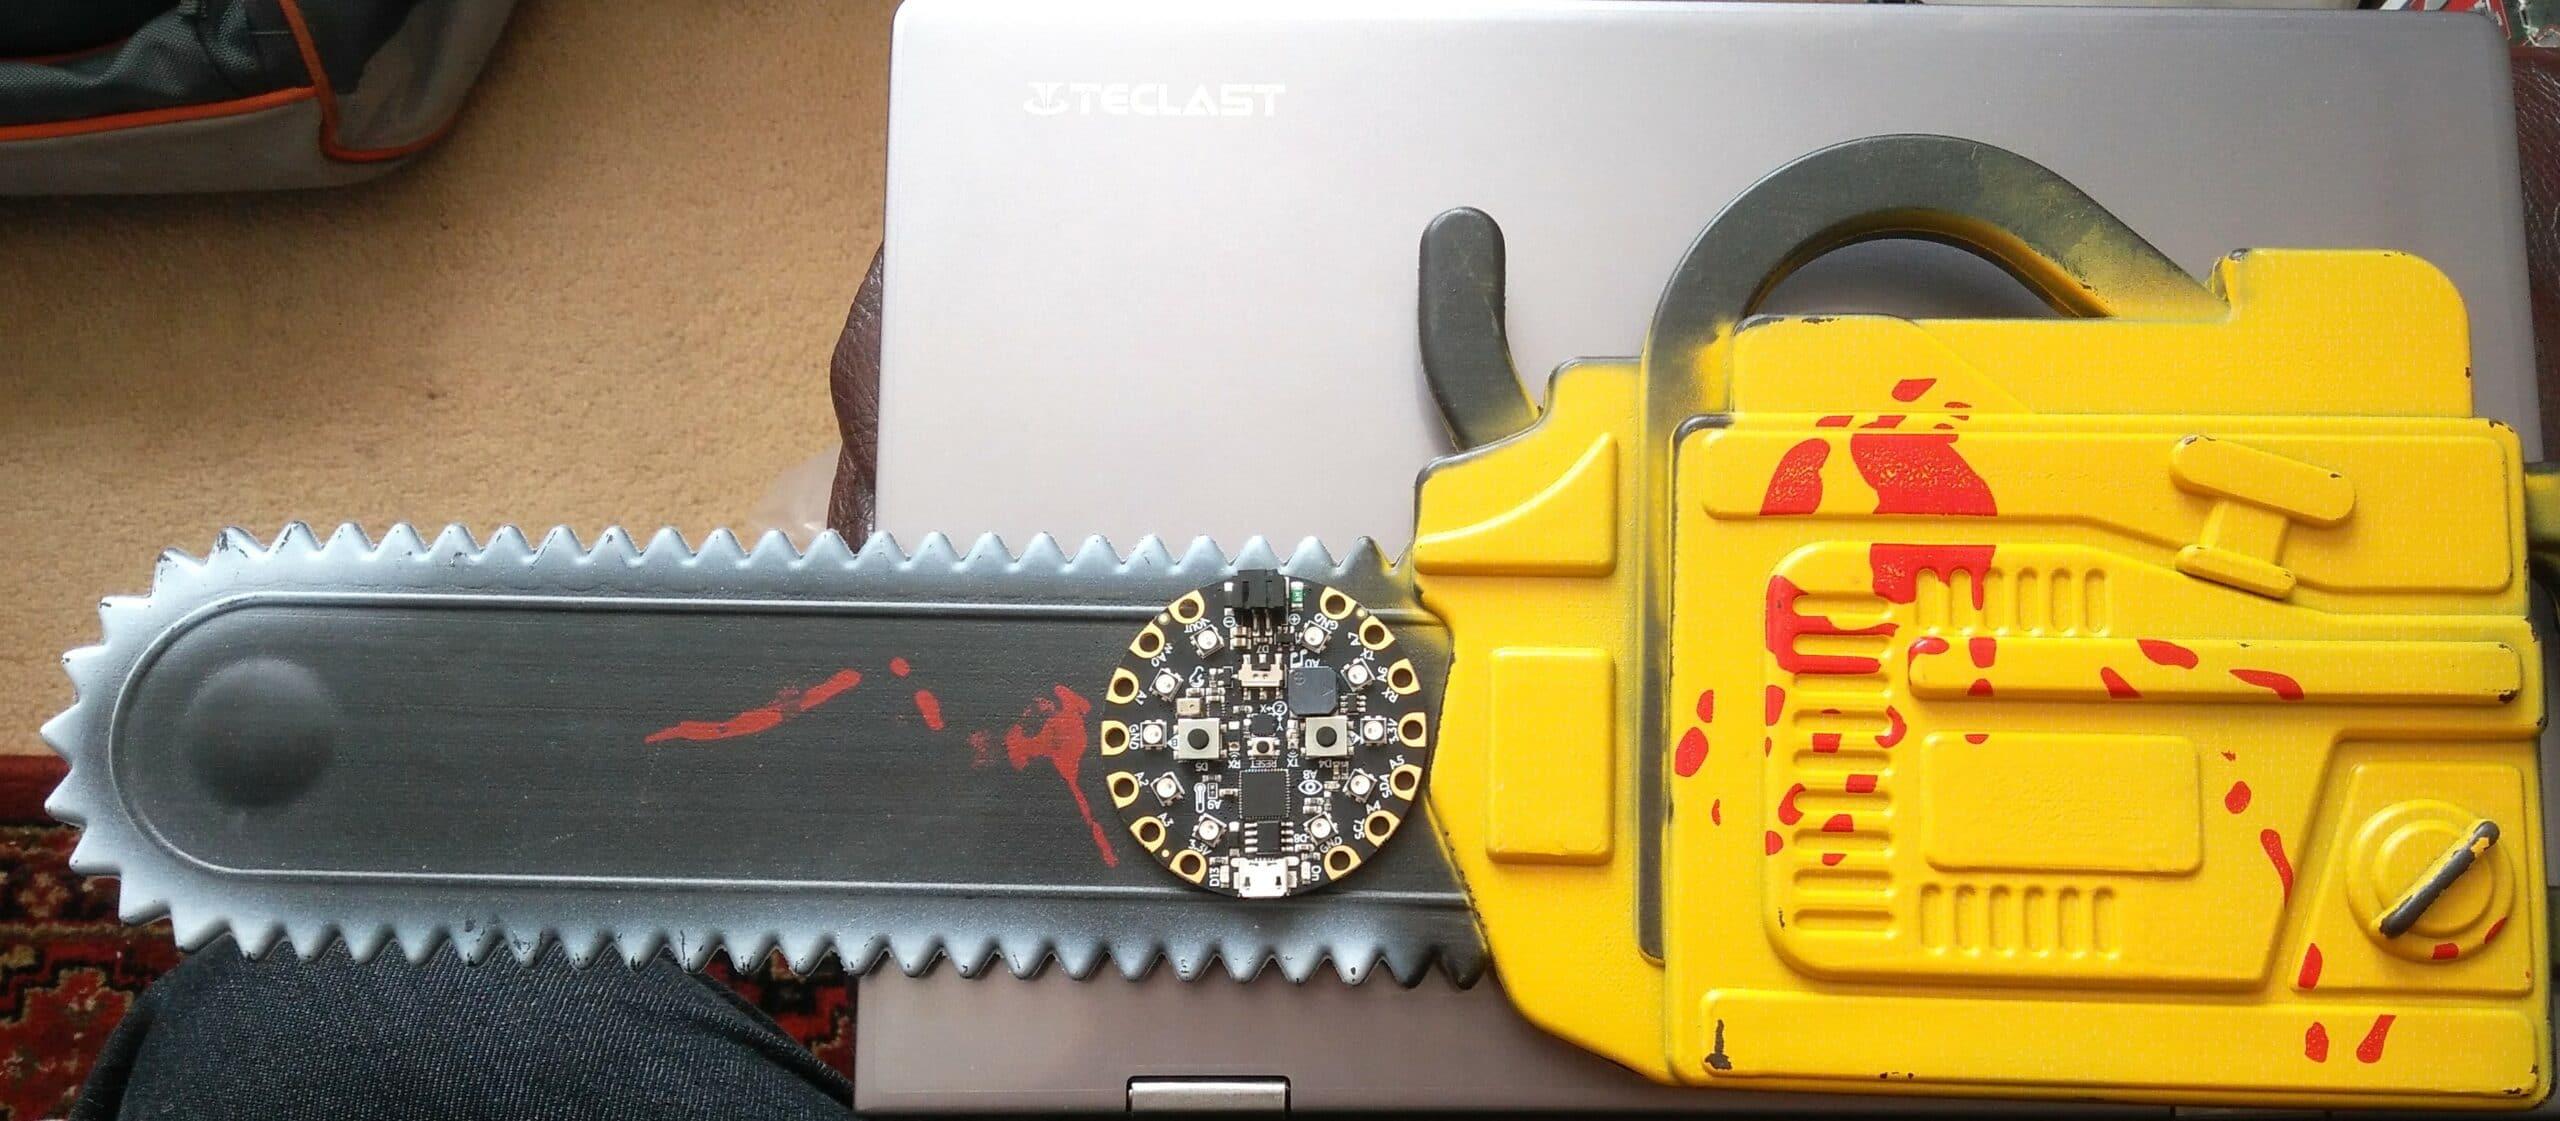 Horror-Motorsäge aus Spielzeug gebaut. (Foto: bigl.es)